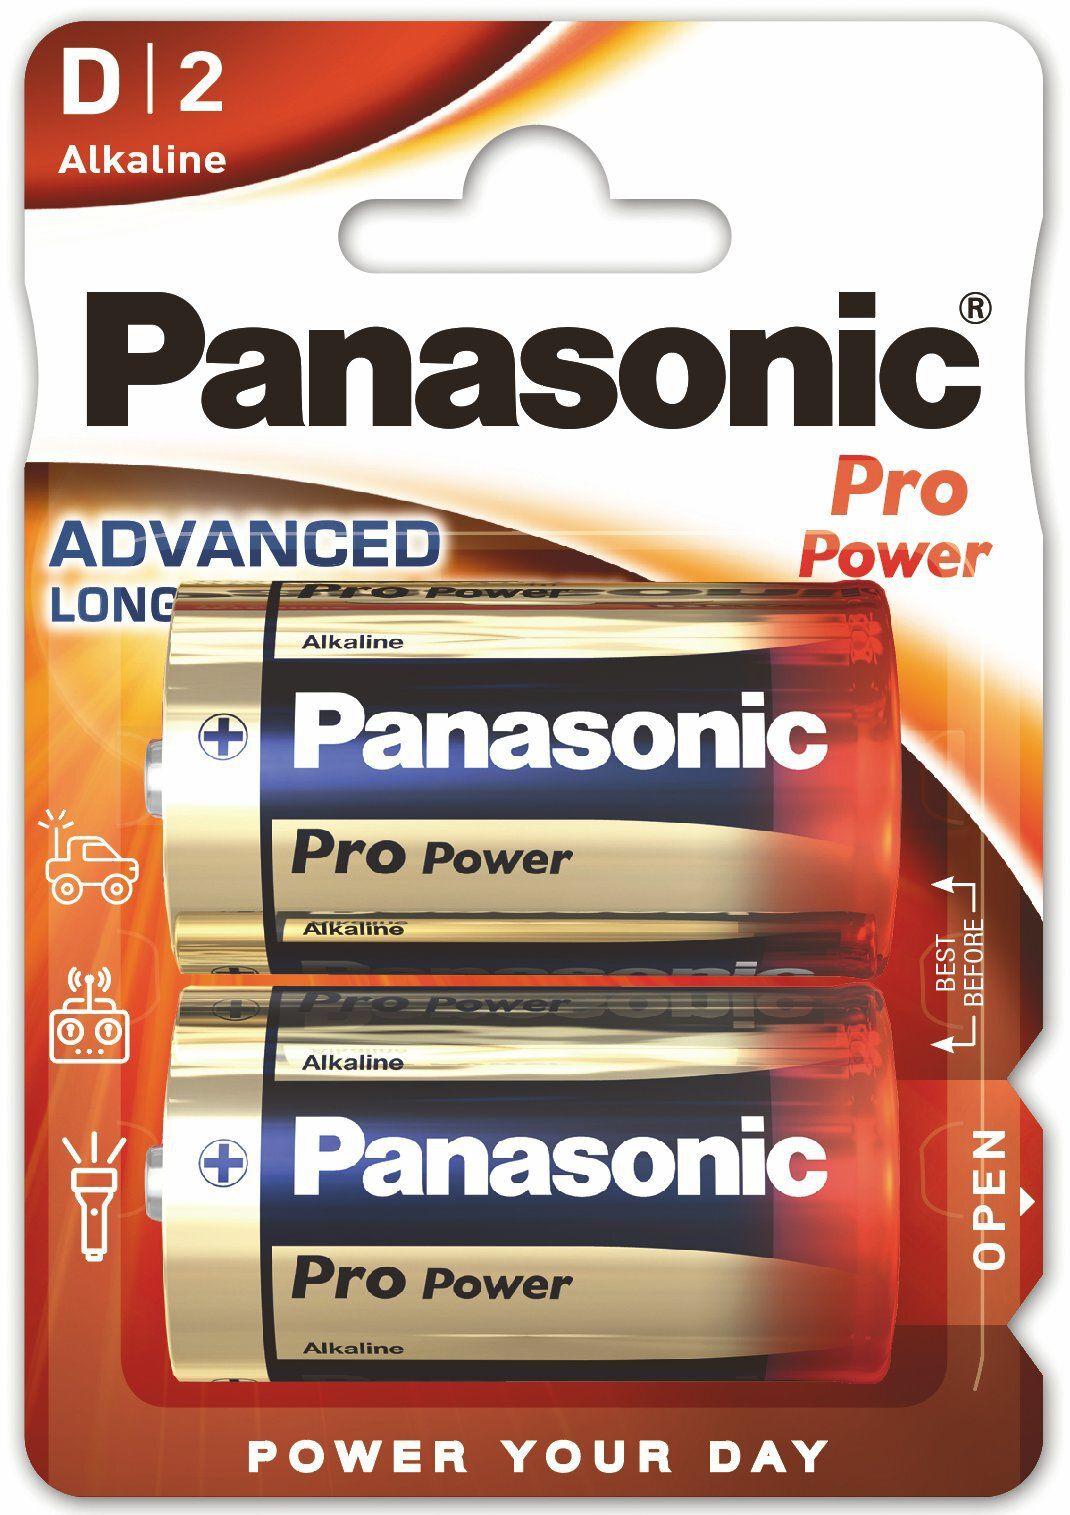 2 x Panasonic Alkaline PRO Power LR20/D (blister)